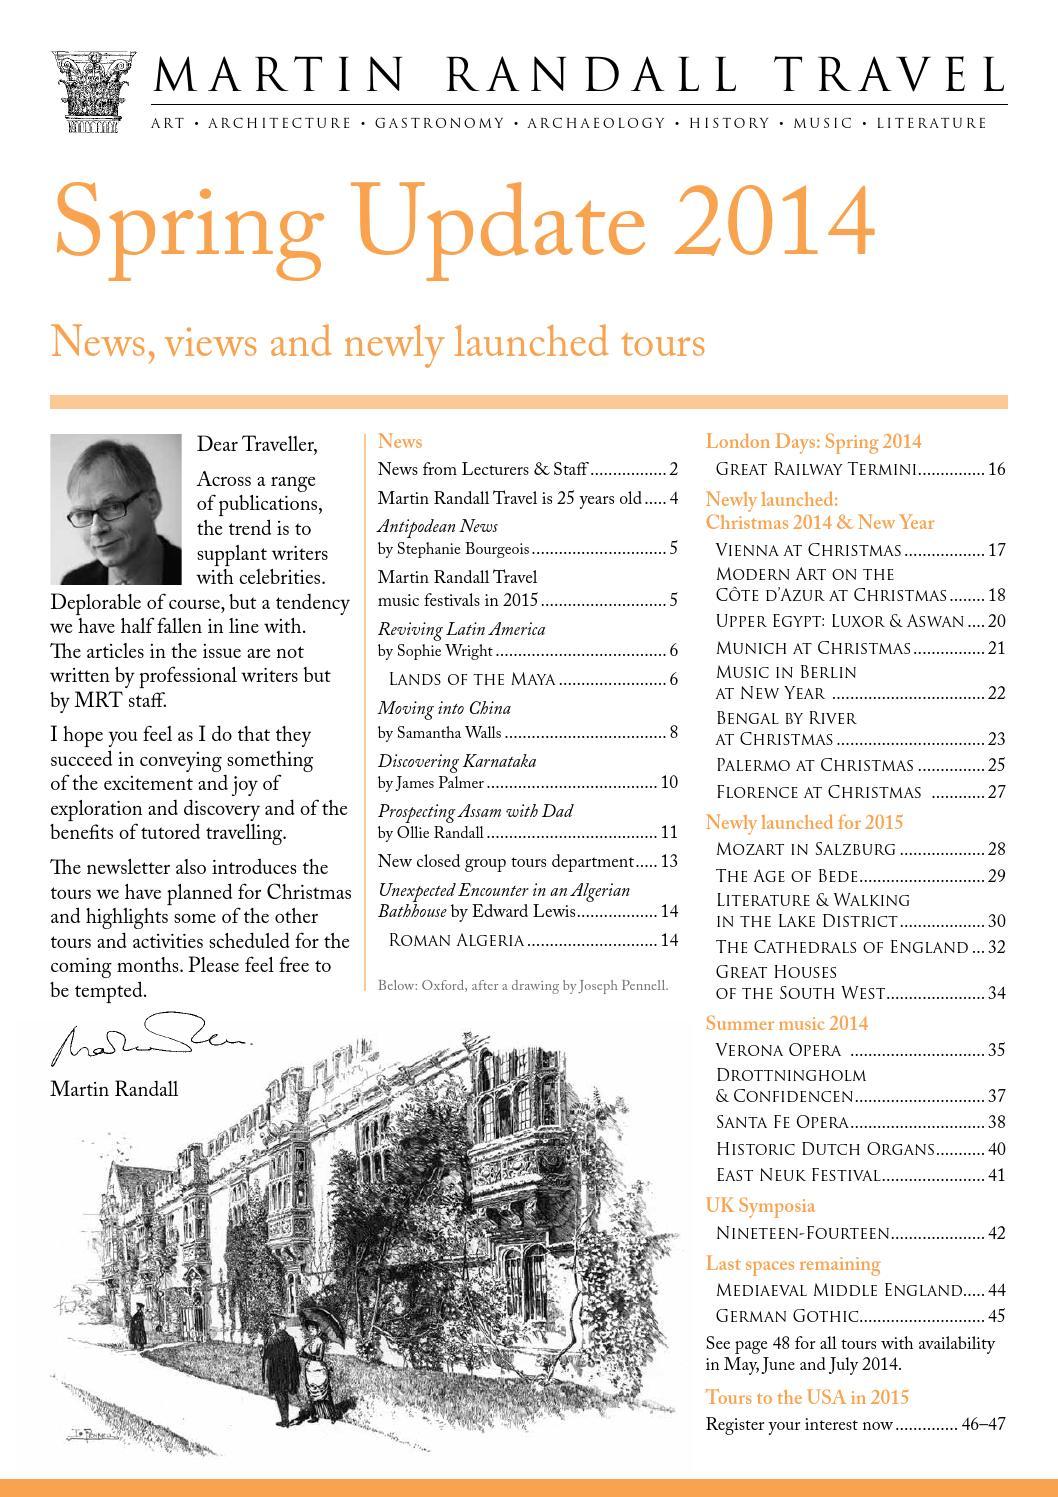 Spring Update 2014 By Martin Randall Travel Issuu Calcutta Winchester Ornate Bowl Light Ceiling Fan